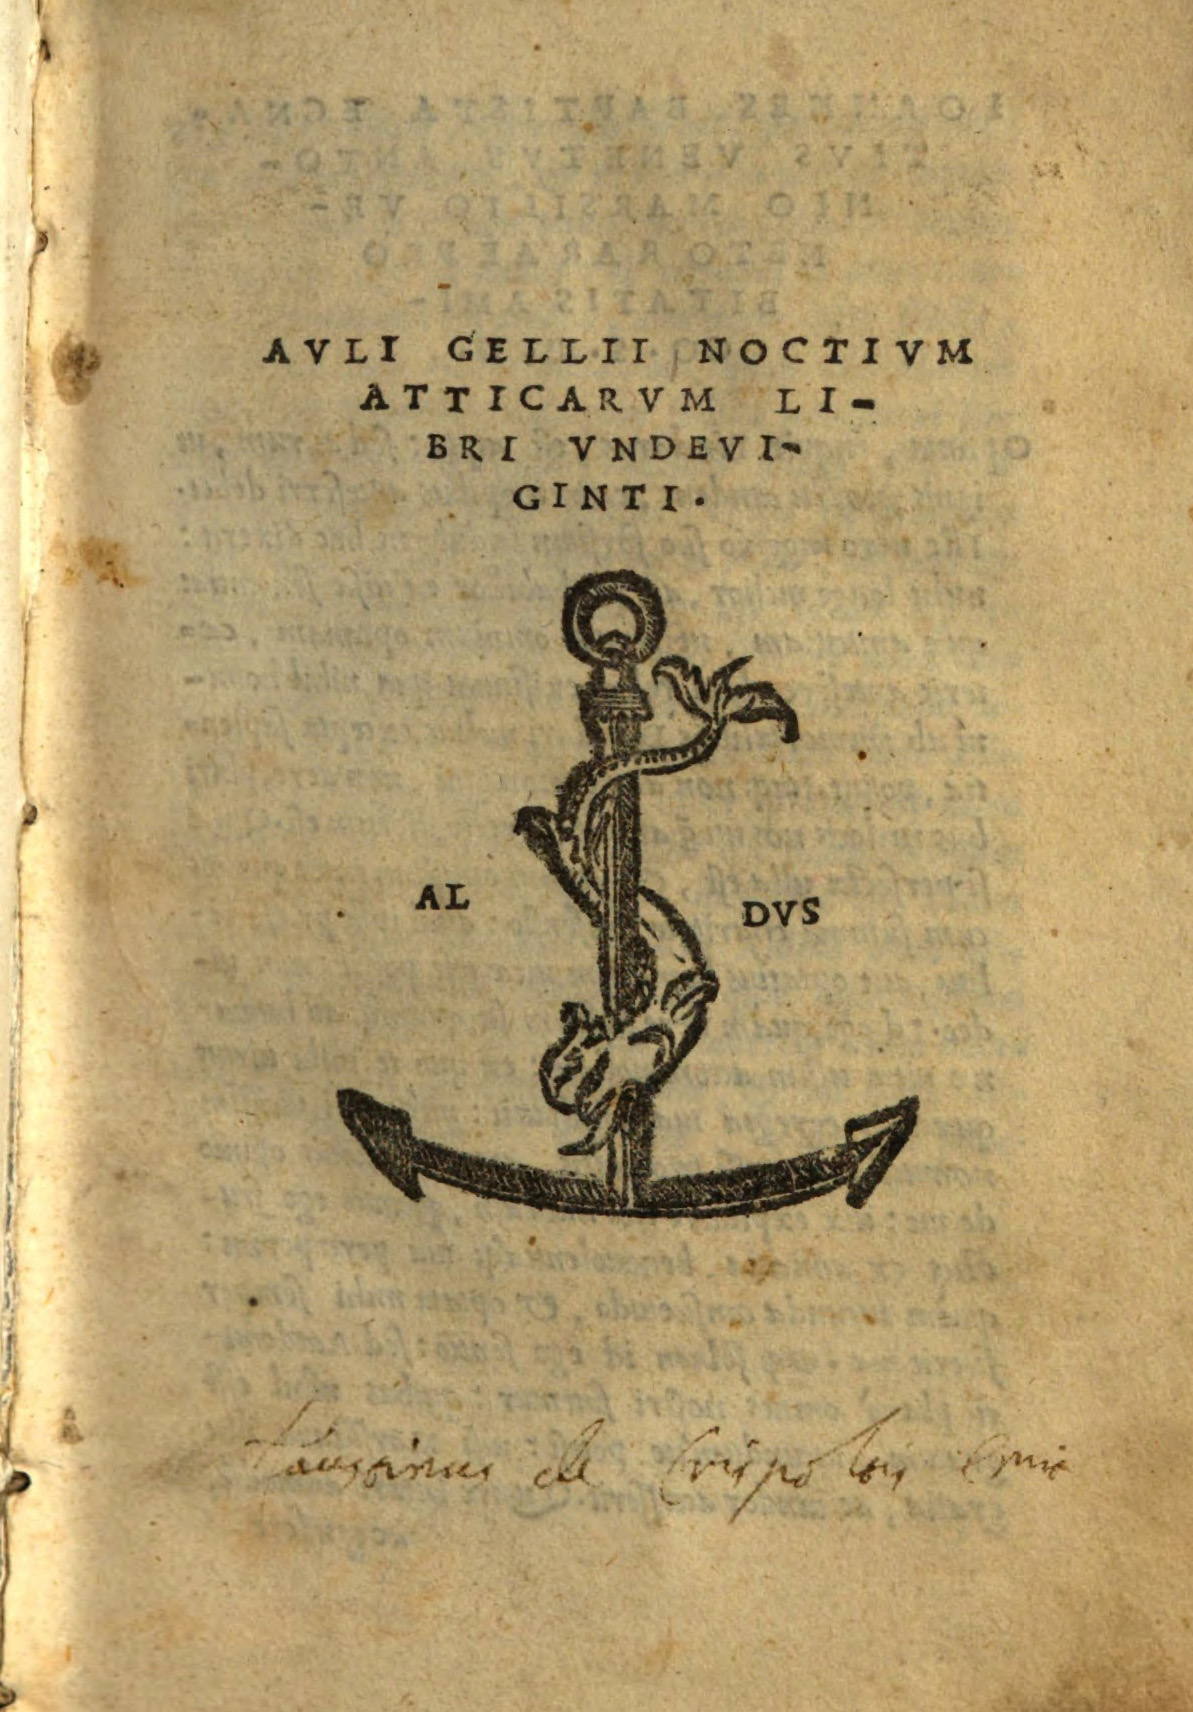 Титул Авл Геллия. Аттические ночи. Издания 1515